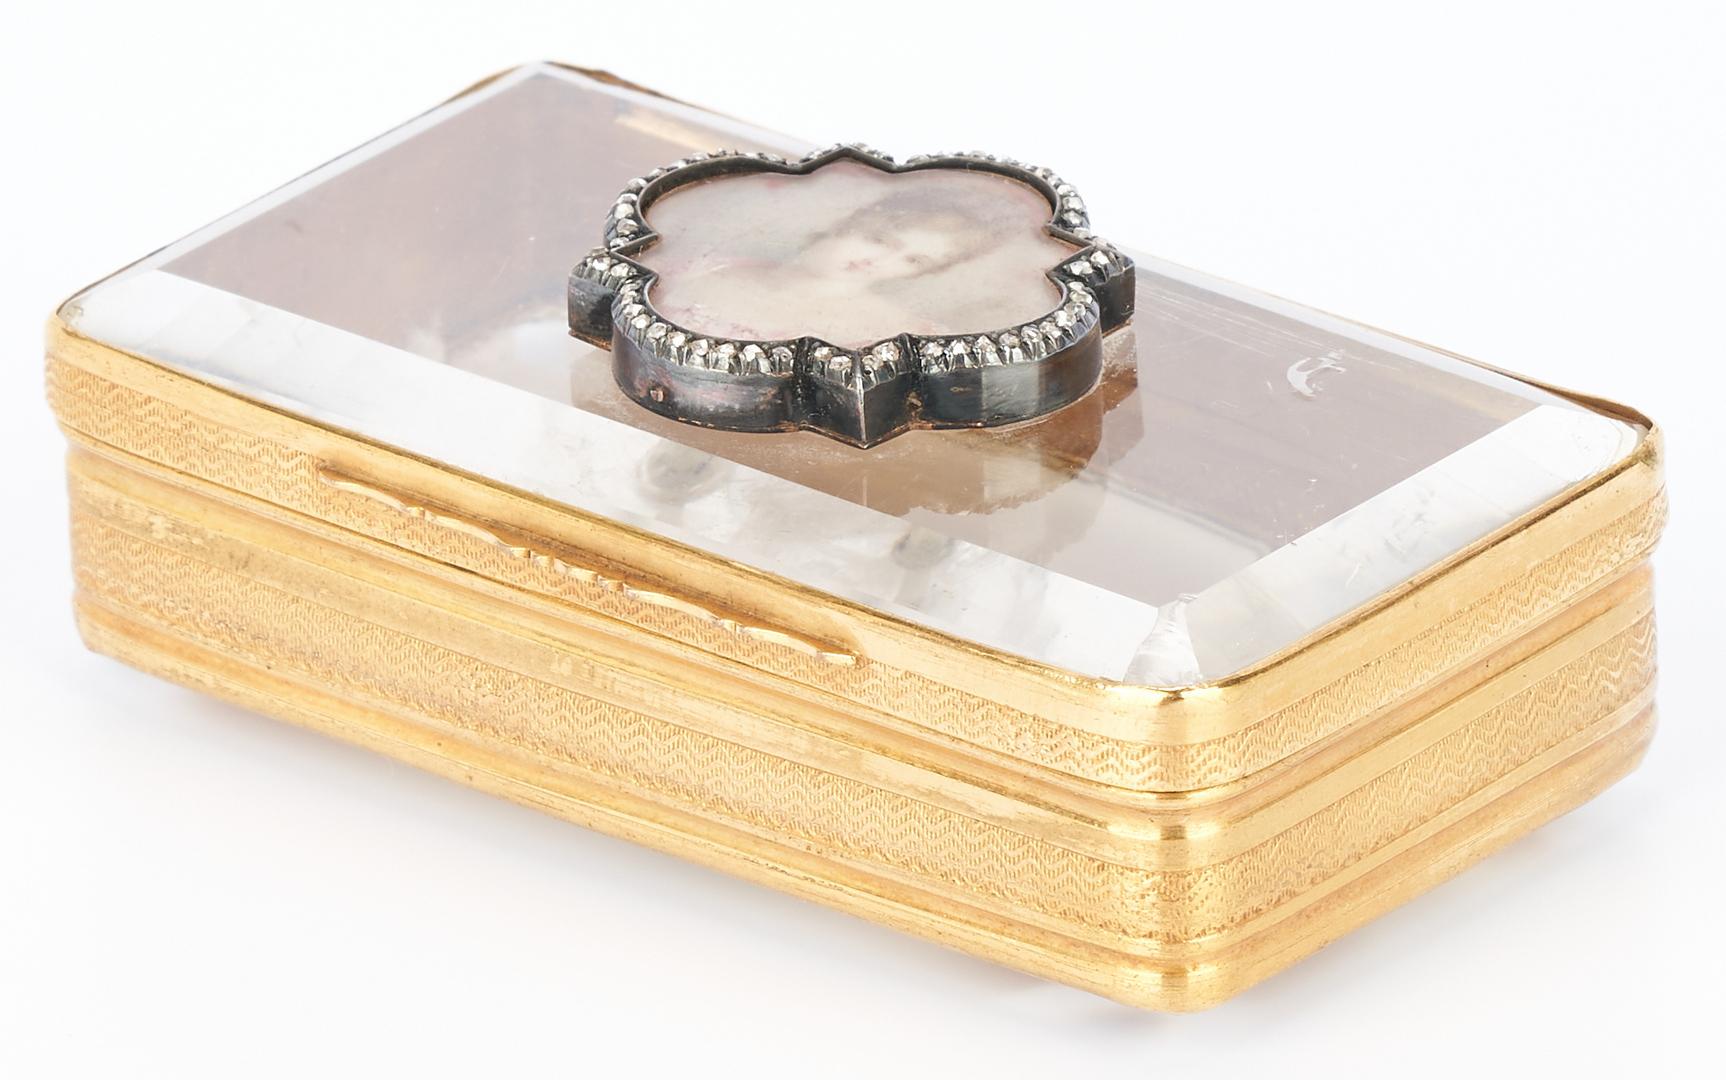 Lot 44: 14K Gold, Diamond, and Quartz Snuff or Pill Box